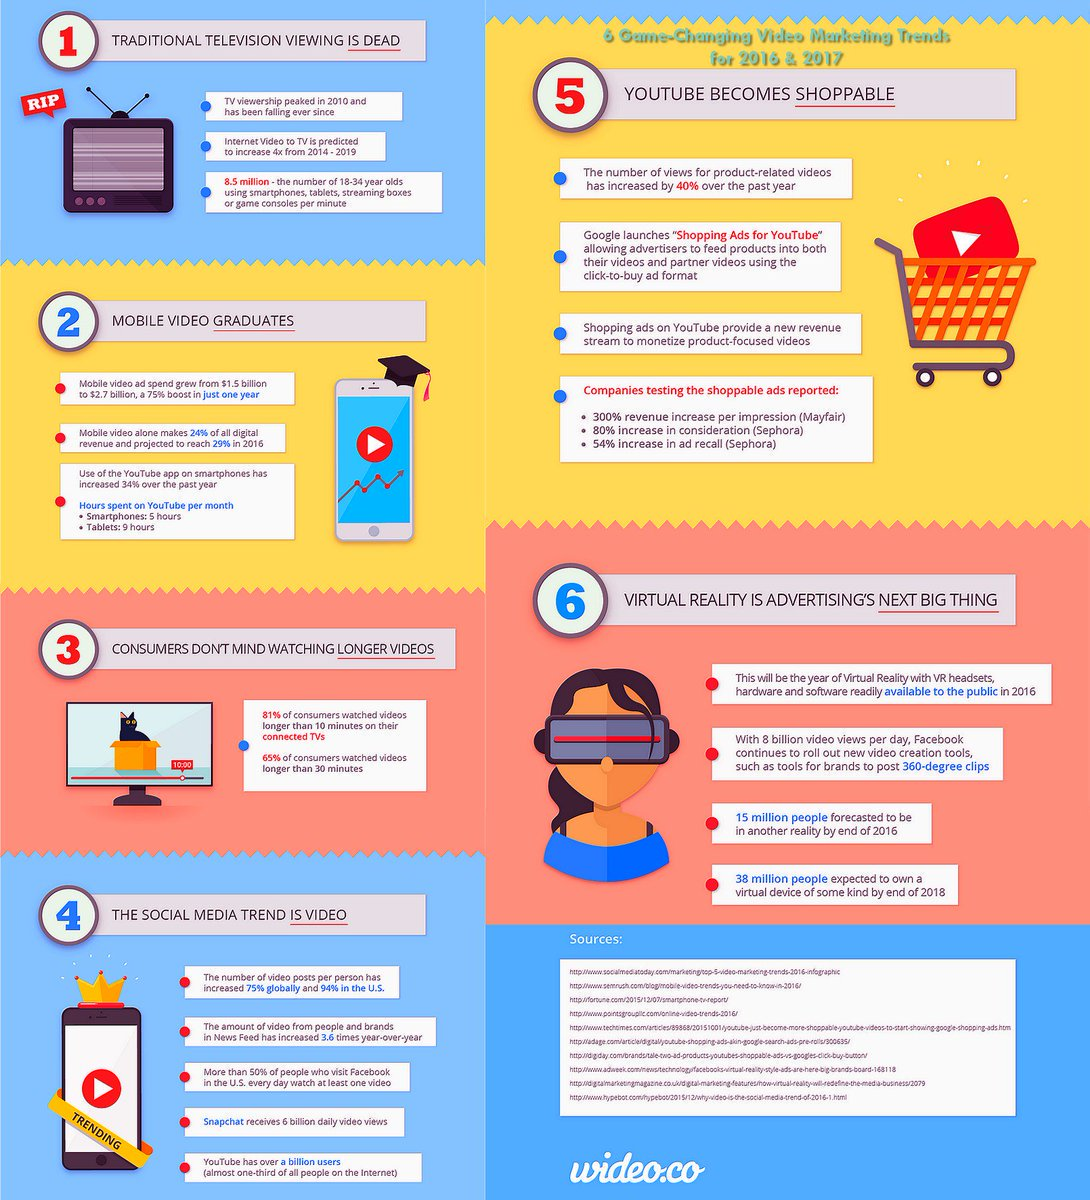 [2017 #DigitalMarketing Trends] 6 Game-Changing #VideoMarketing Trends [Infographic] #ContentMarketing #SocialMedia #Marketing #SMM #VR<br>http://pic.twitter.com/4Sn9MTiAEu